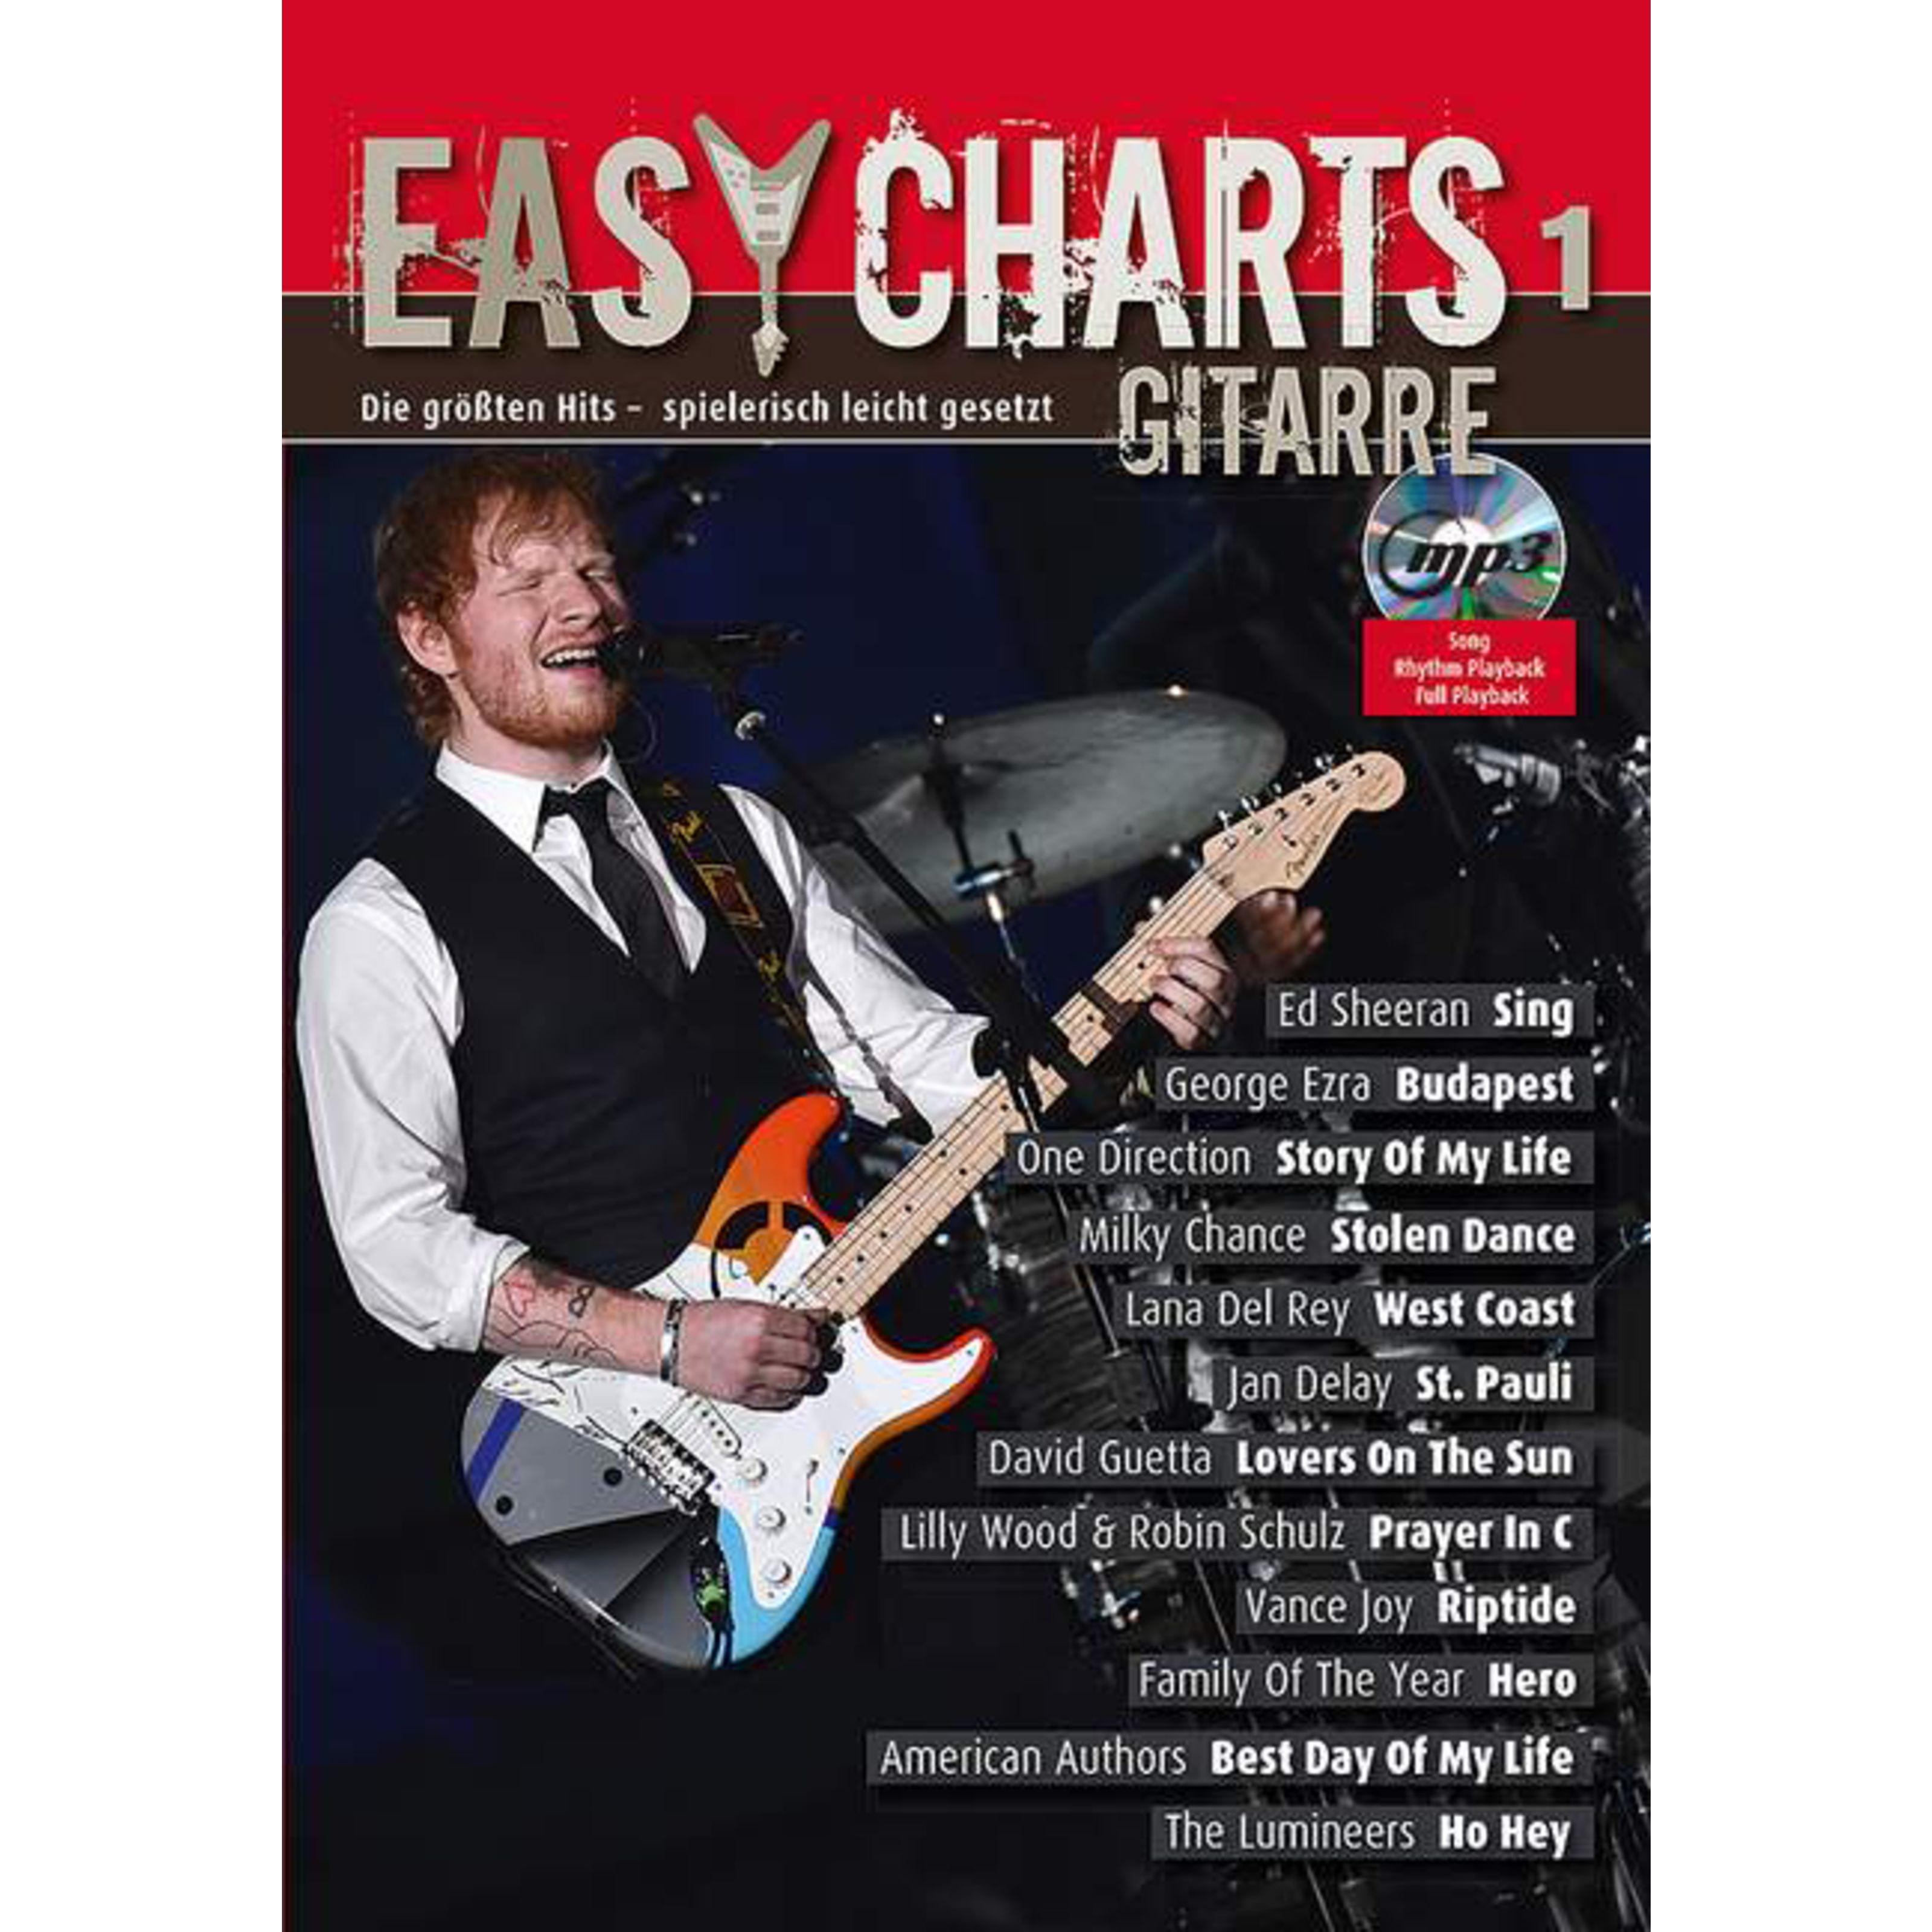 Schott Music - Easy Charts Gitarre 1 Jakut, mit CD MF 3901